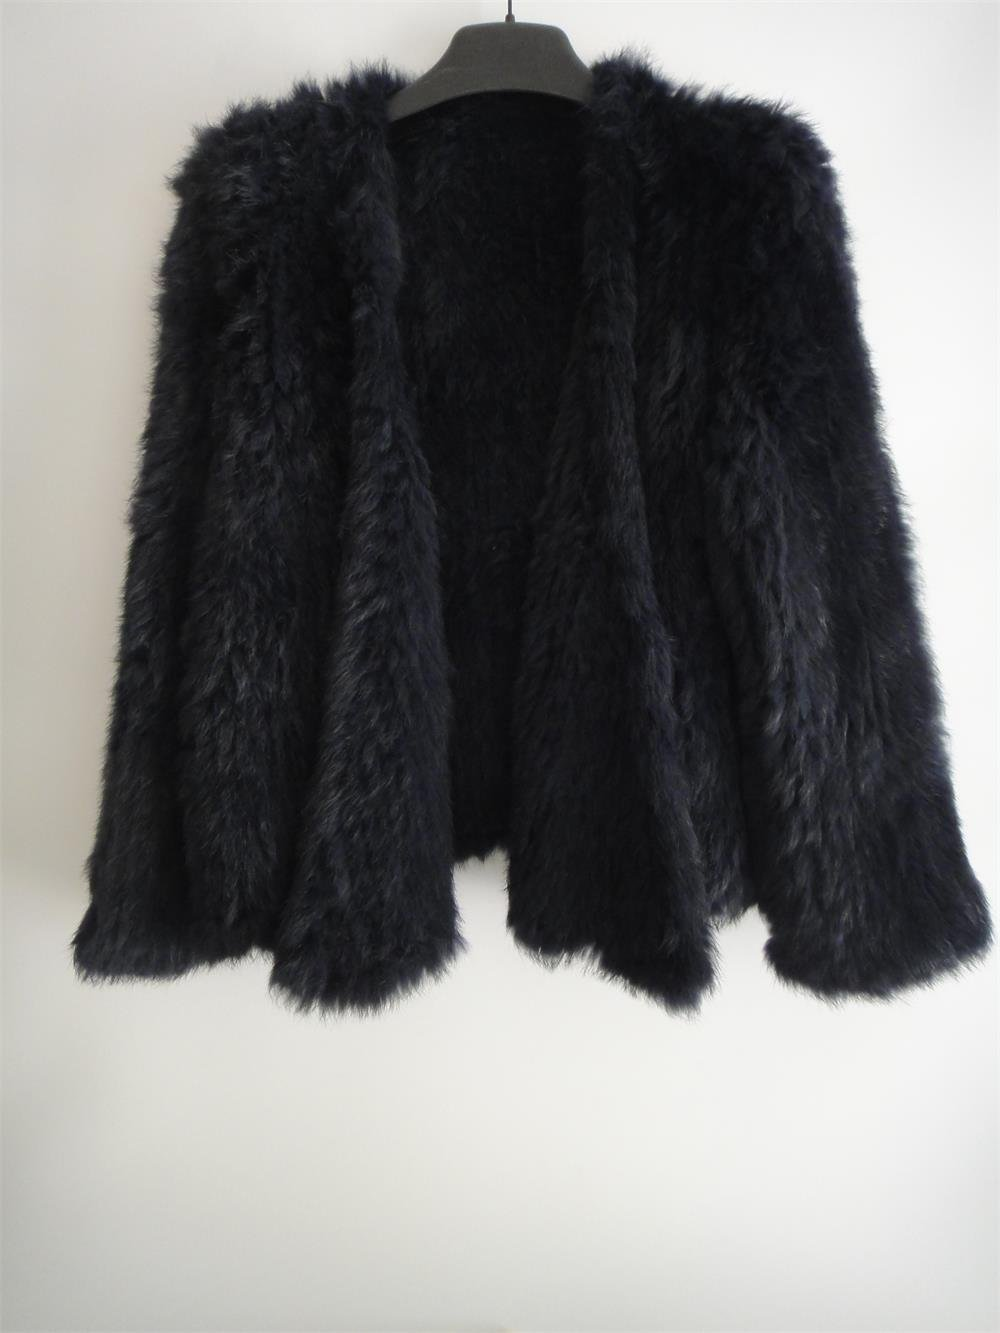 Black/White Crochet Real Rabbit Fur Outwear